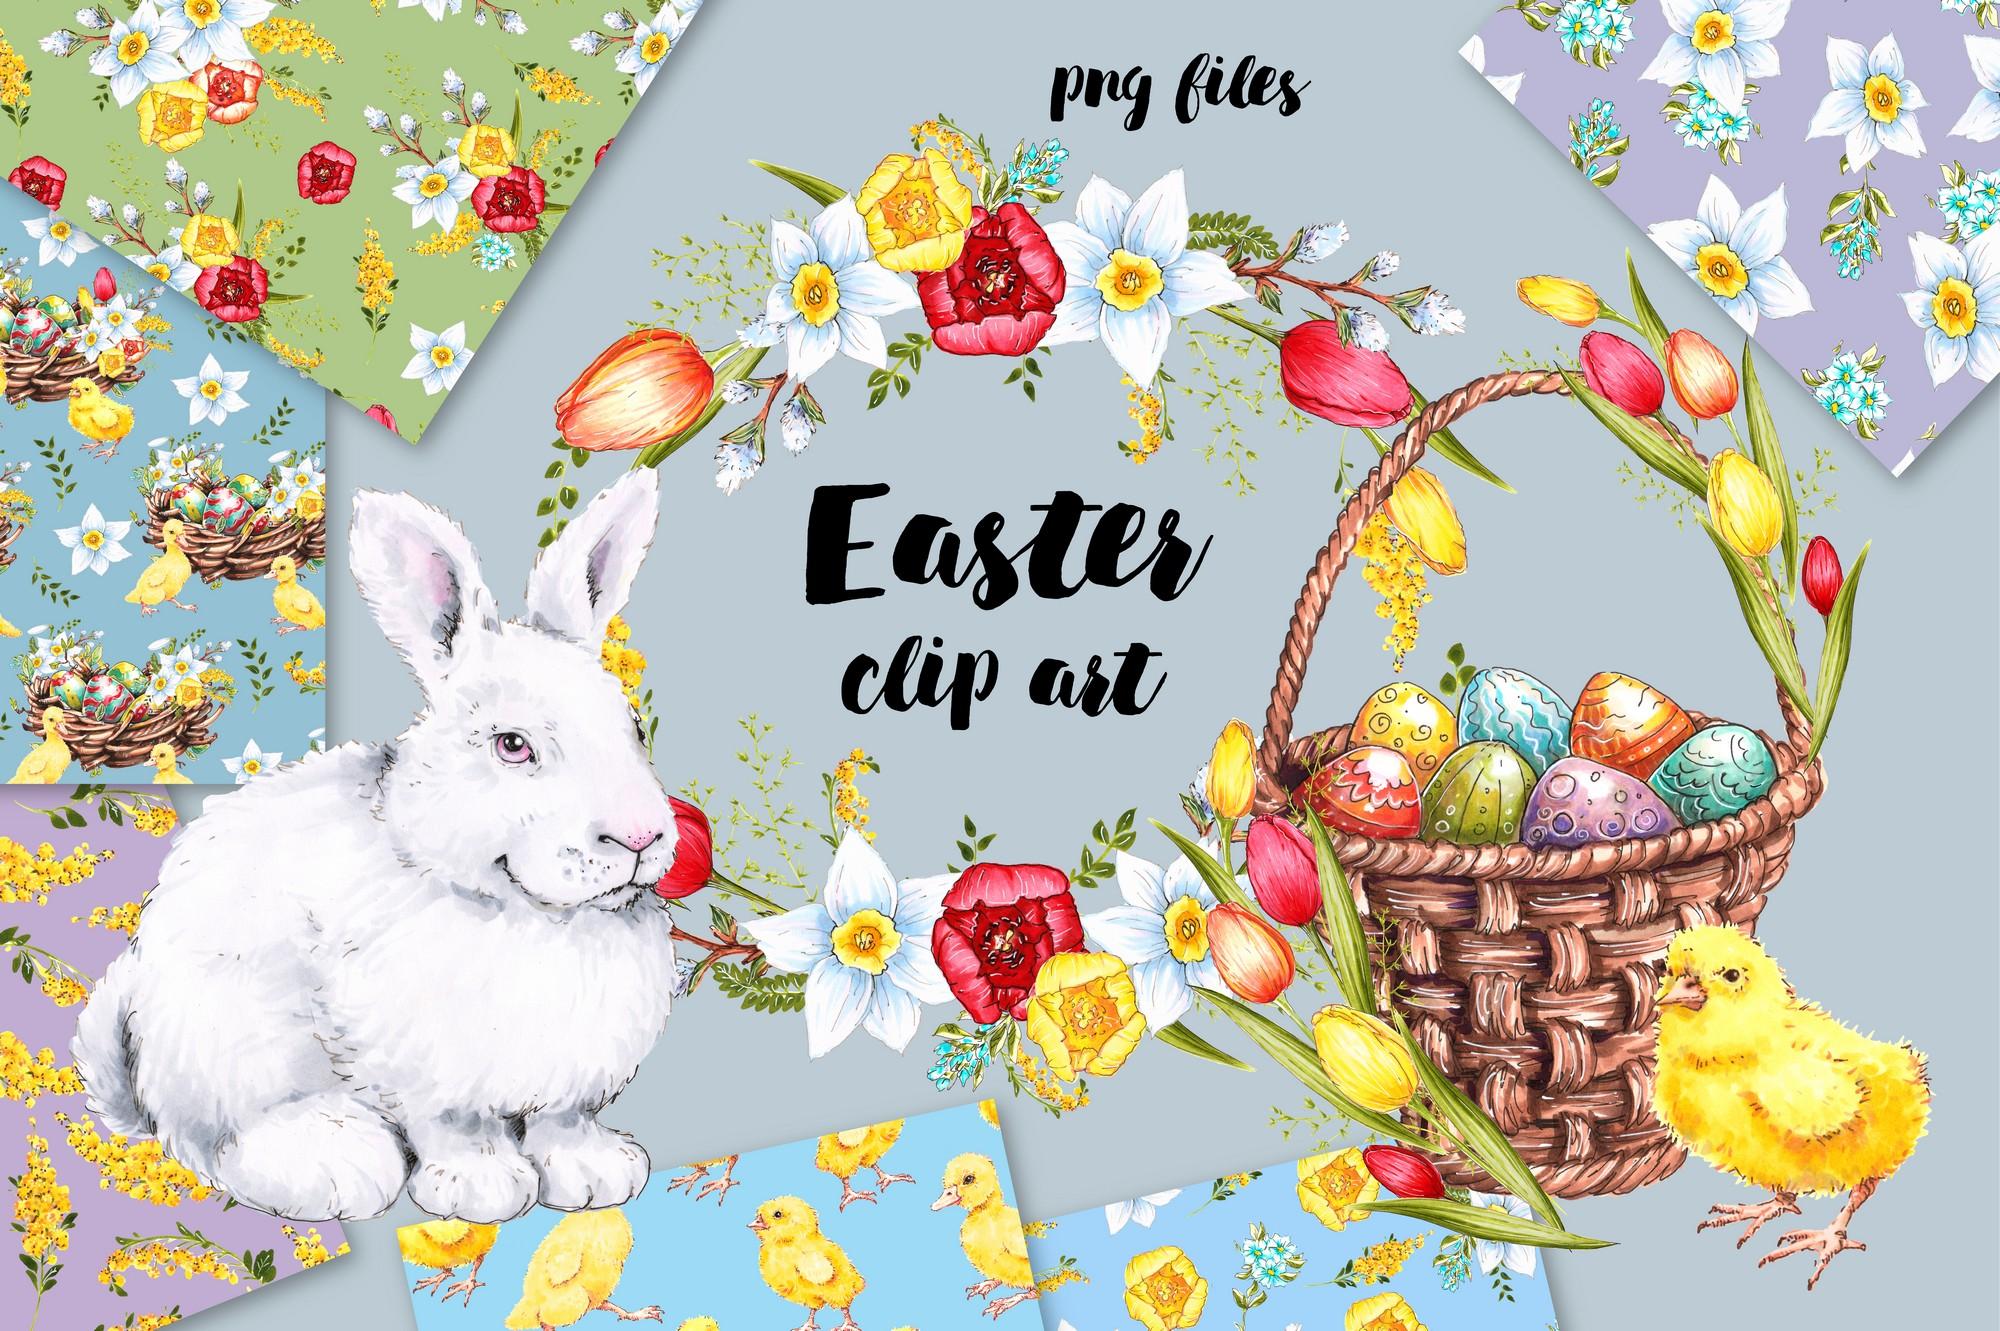 220 Best Easter Graphics in 2020: Free & Premium - 1 7